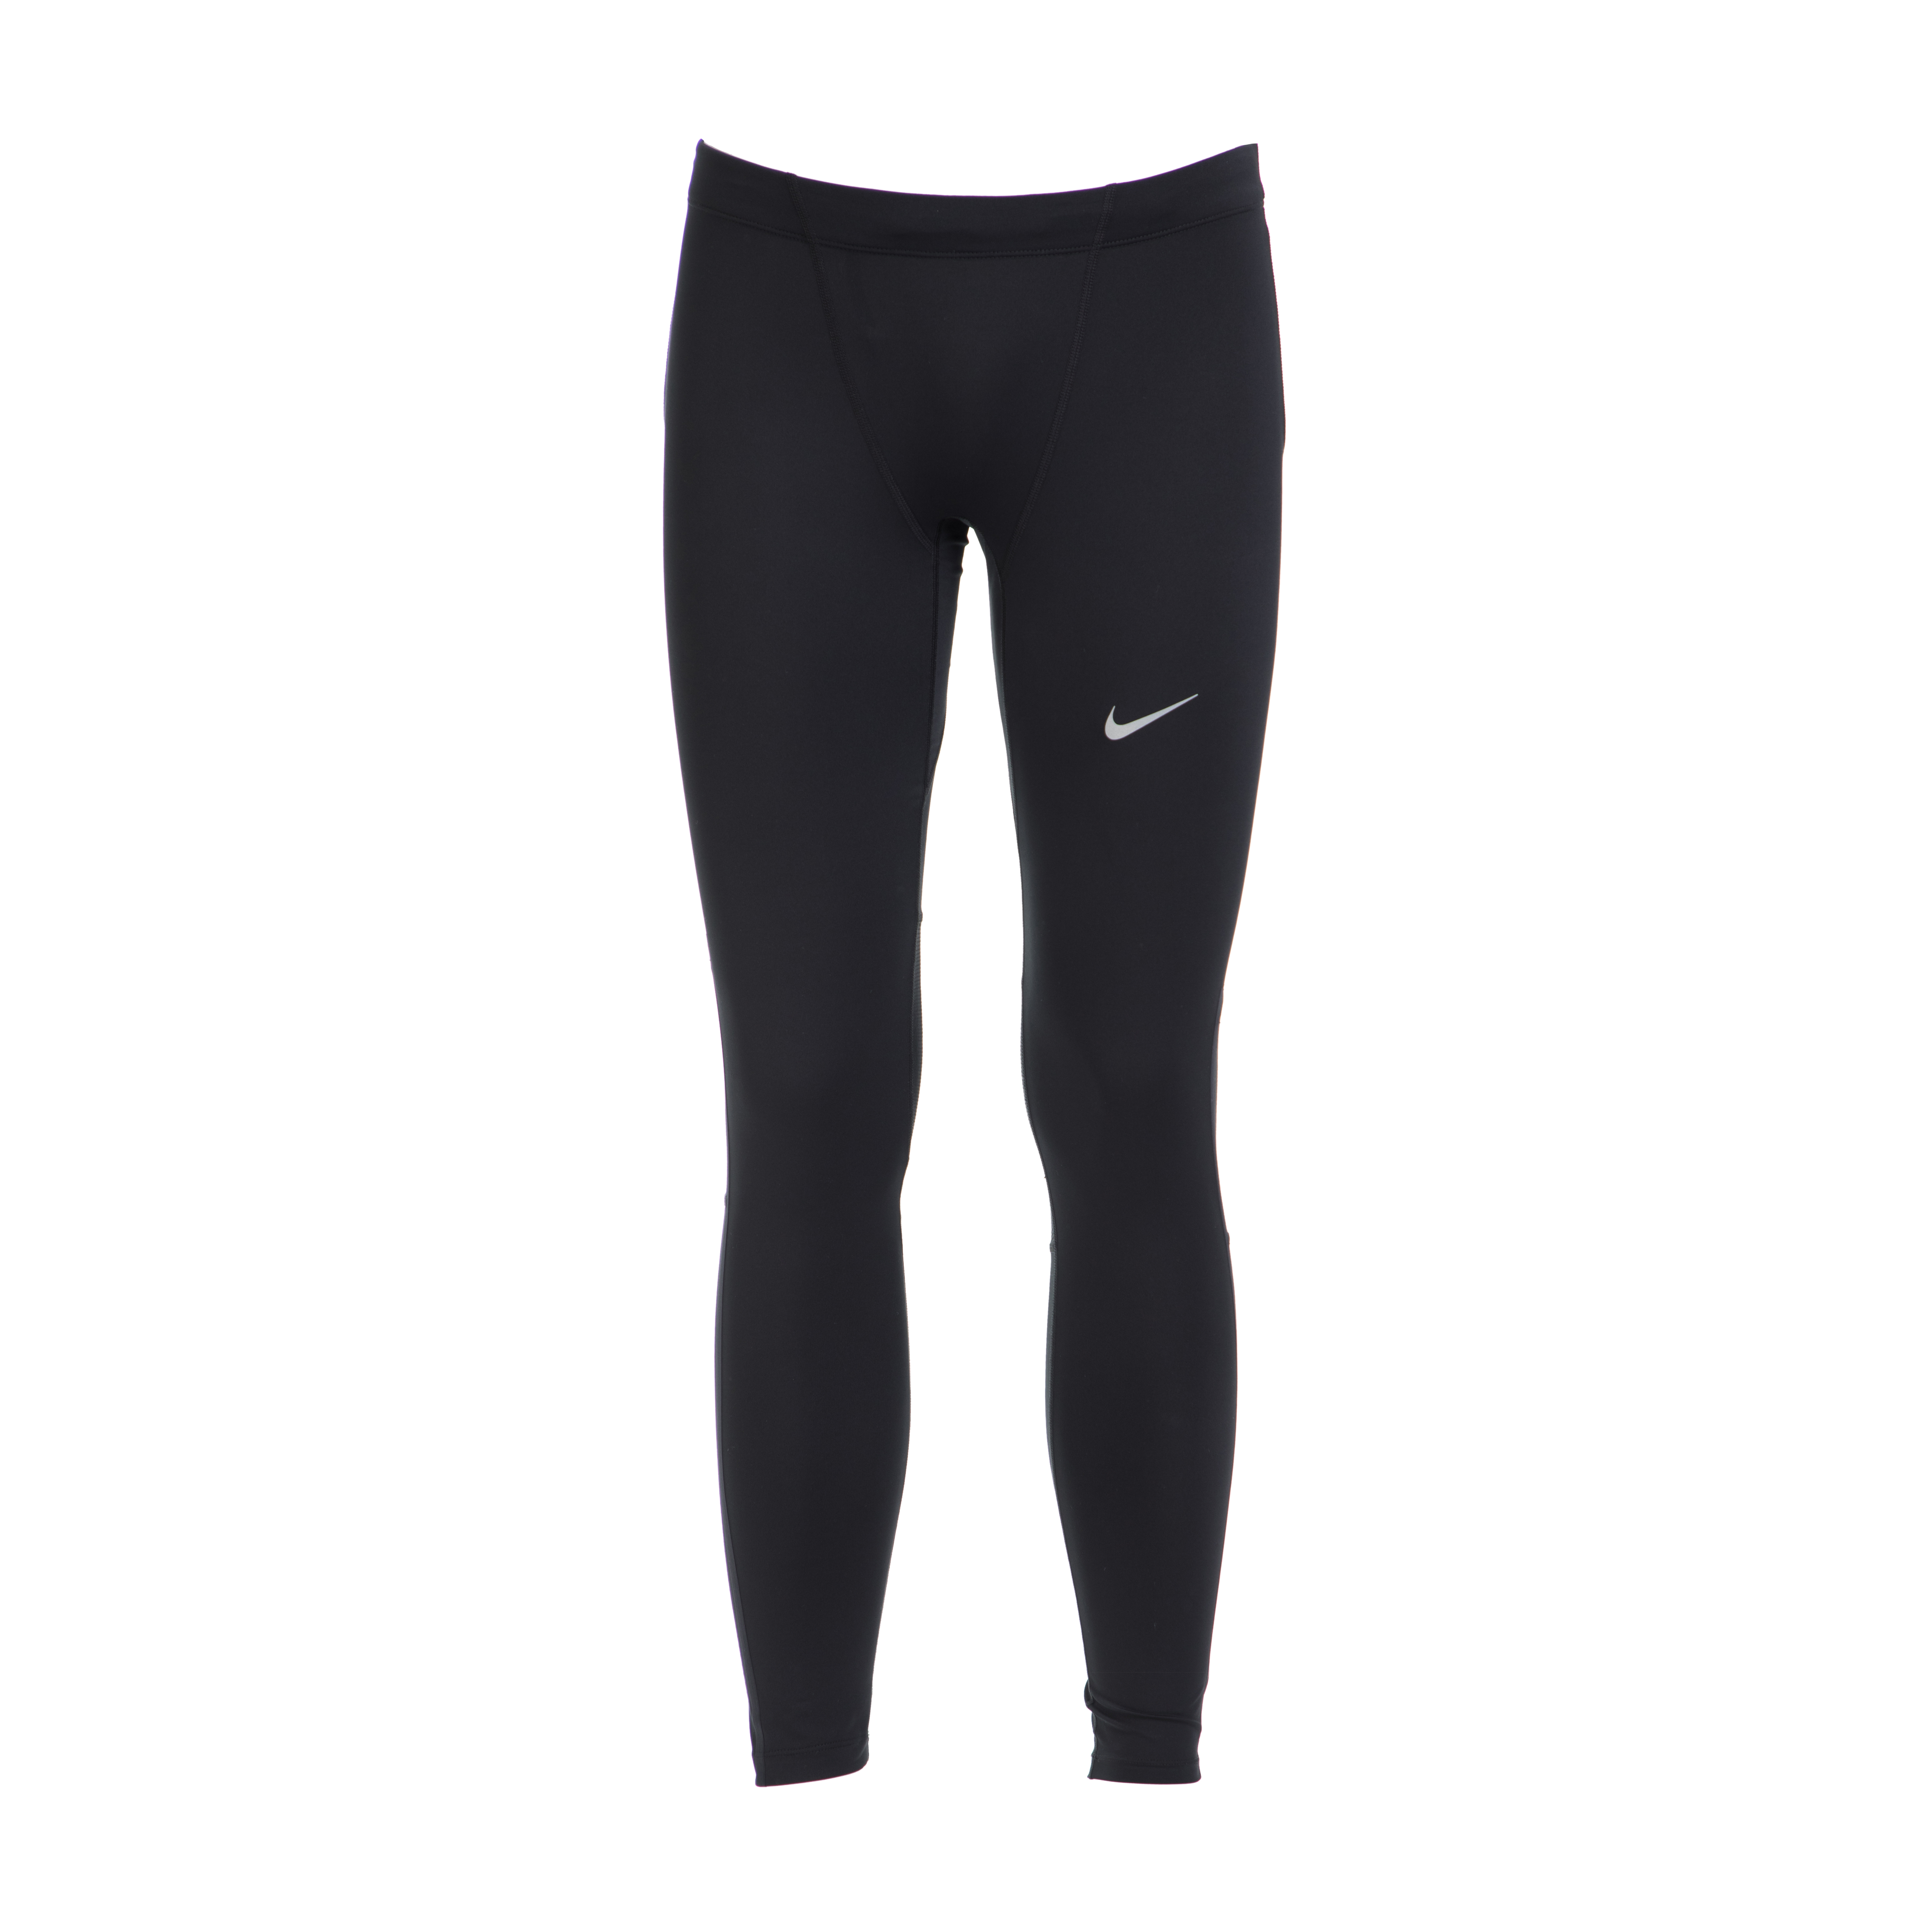 NIKE - Ανδρικό κολάν NΙKΕ PWR FLSH TECH μαύρο ανδρικά ρούχα αθλητικά κολάν